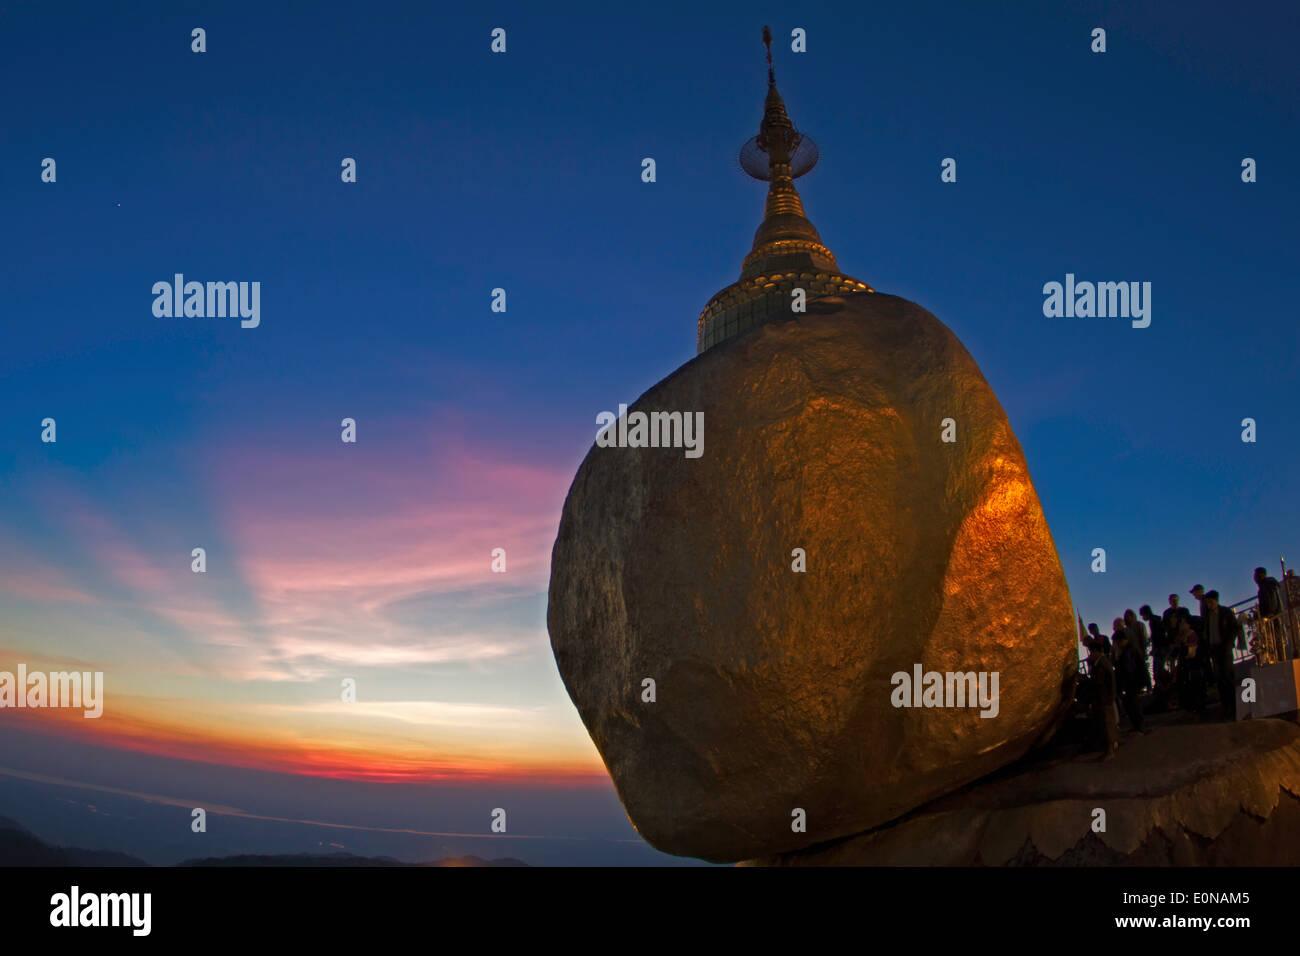 1993cff59a69 Golden Rock Pagoda Kyaiktiyo al tramonto MYANMAR Birmania Immagini Stock